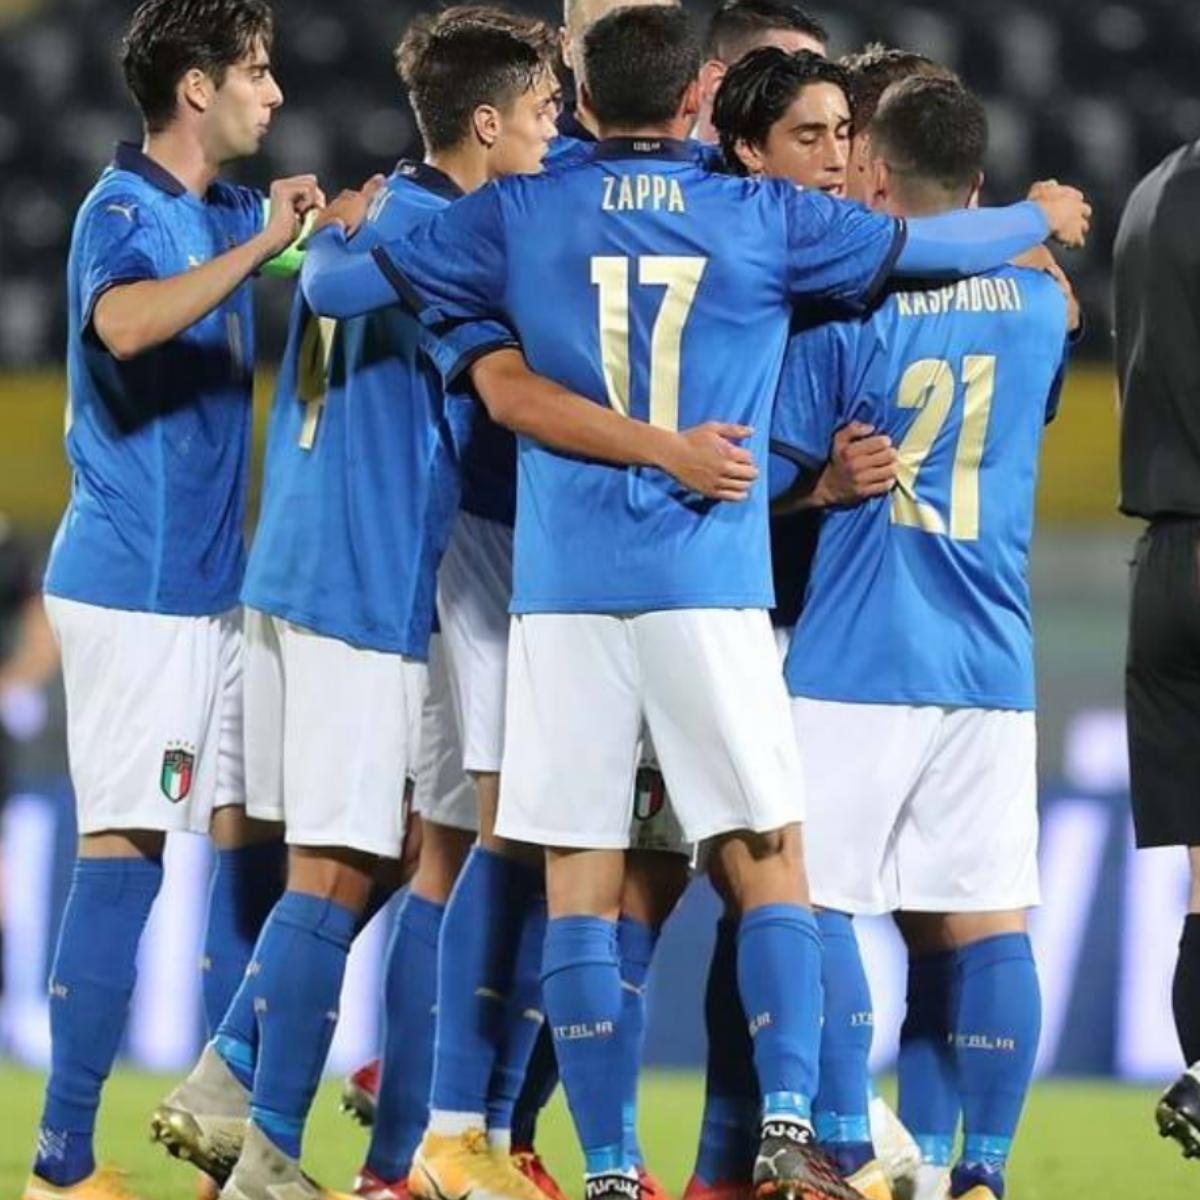 Sorteggiati i gironi dell'Europeo Under 21